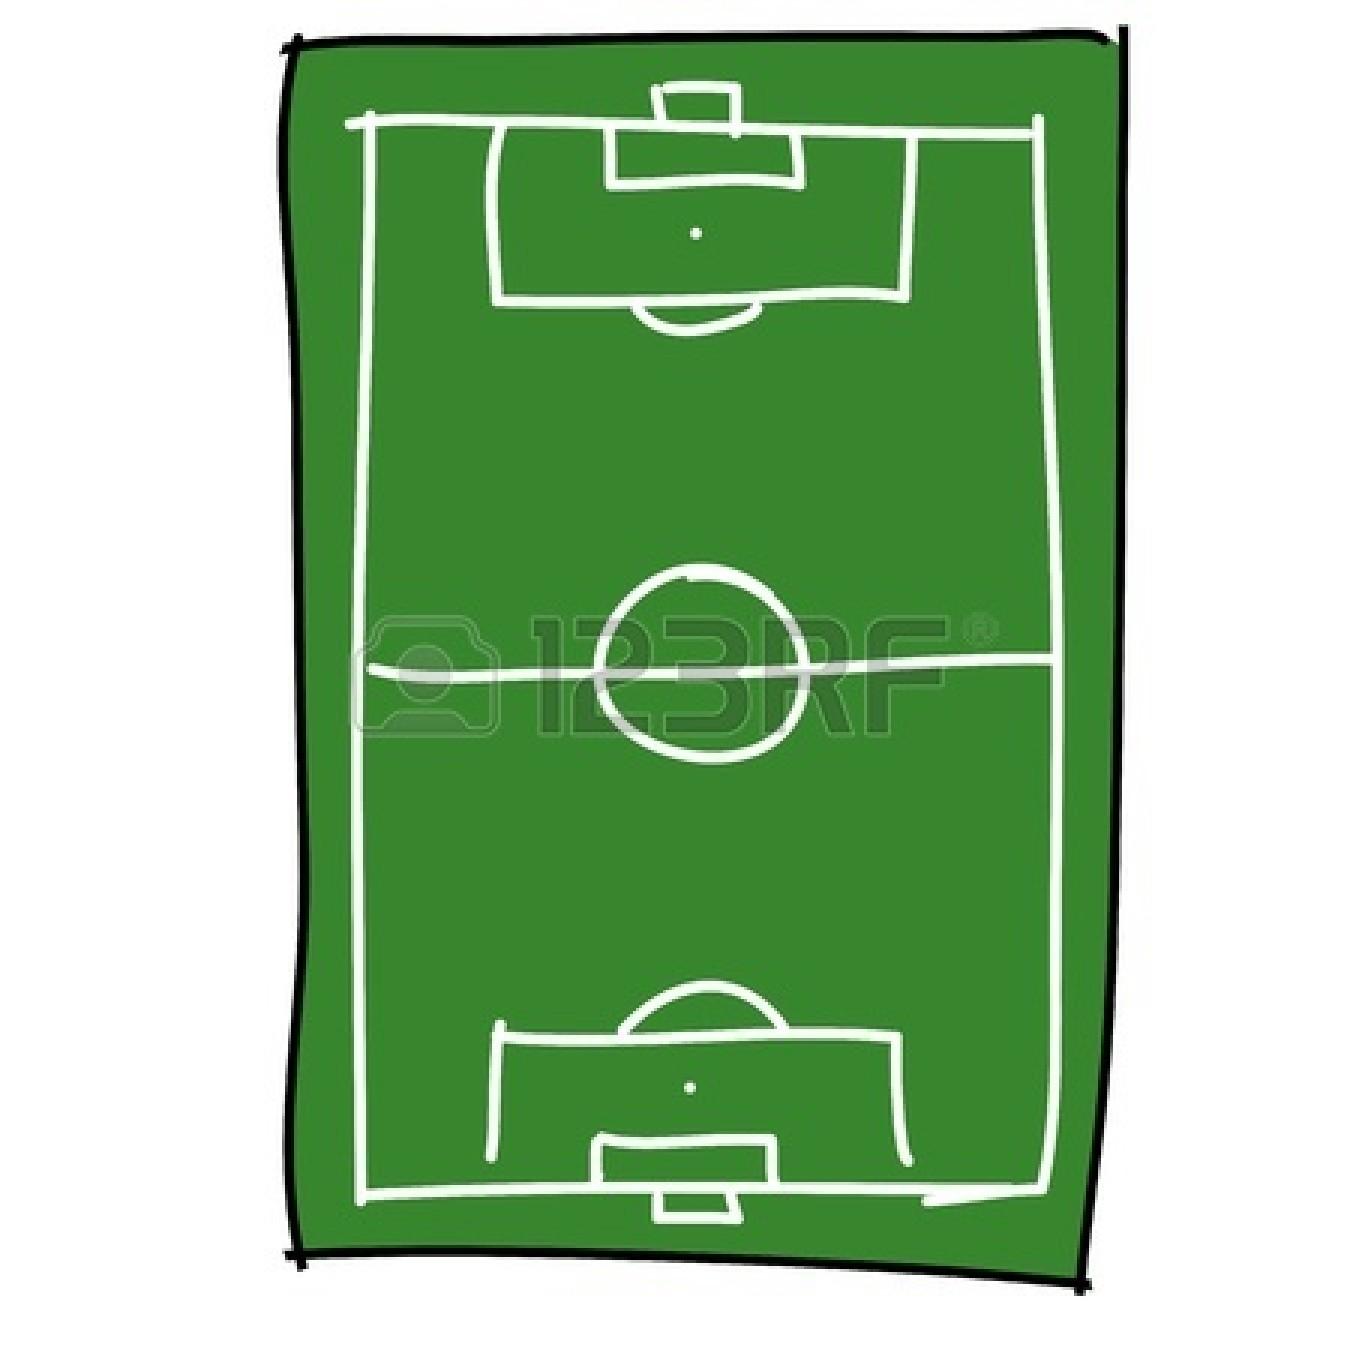 1350x1350 Cartoon Football Field Clip Art